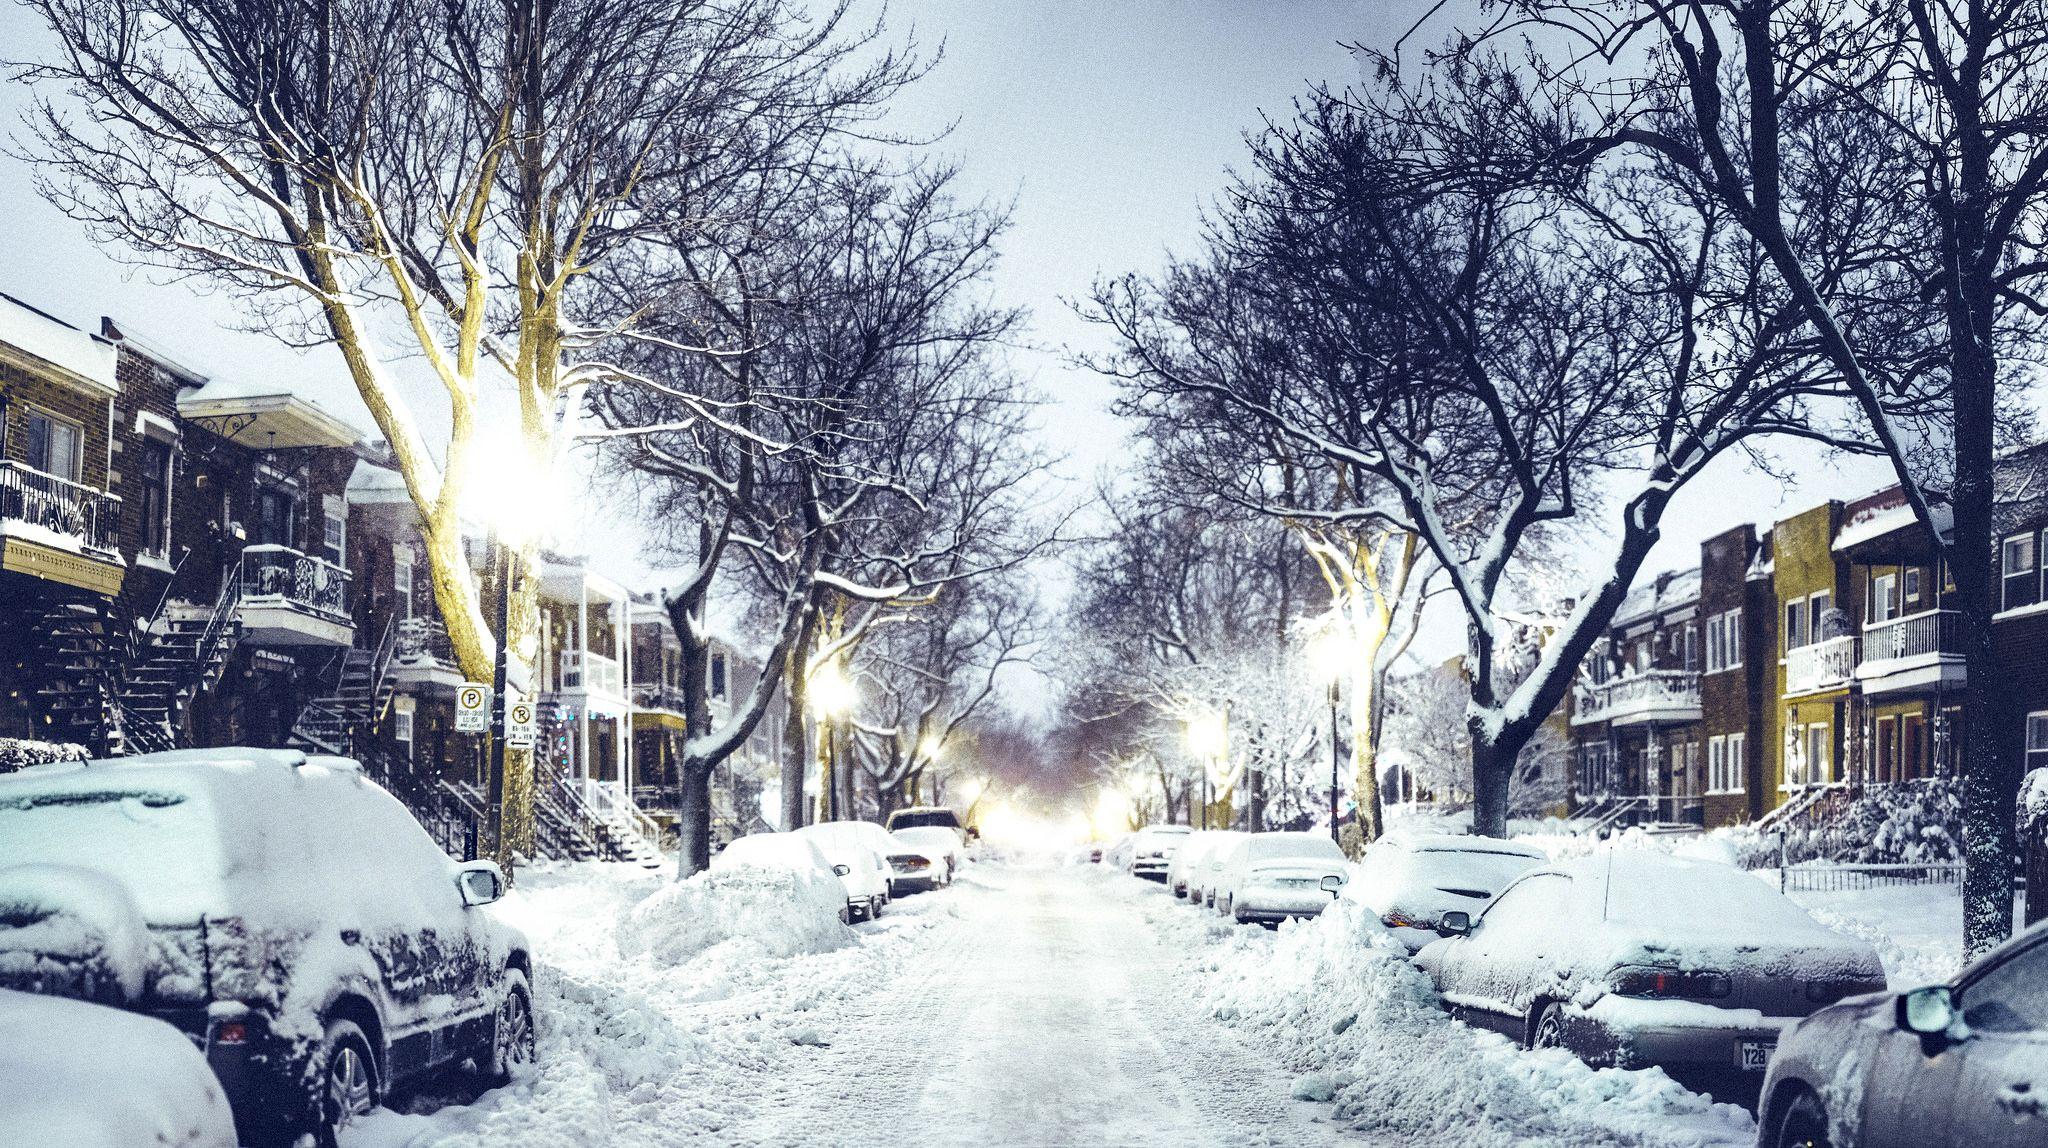 Quebec City Winter Night Winter City Canada City Winter Wallpaper